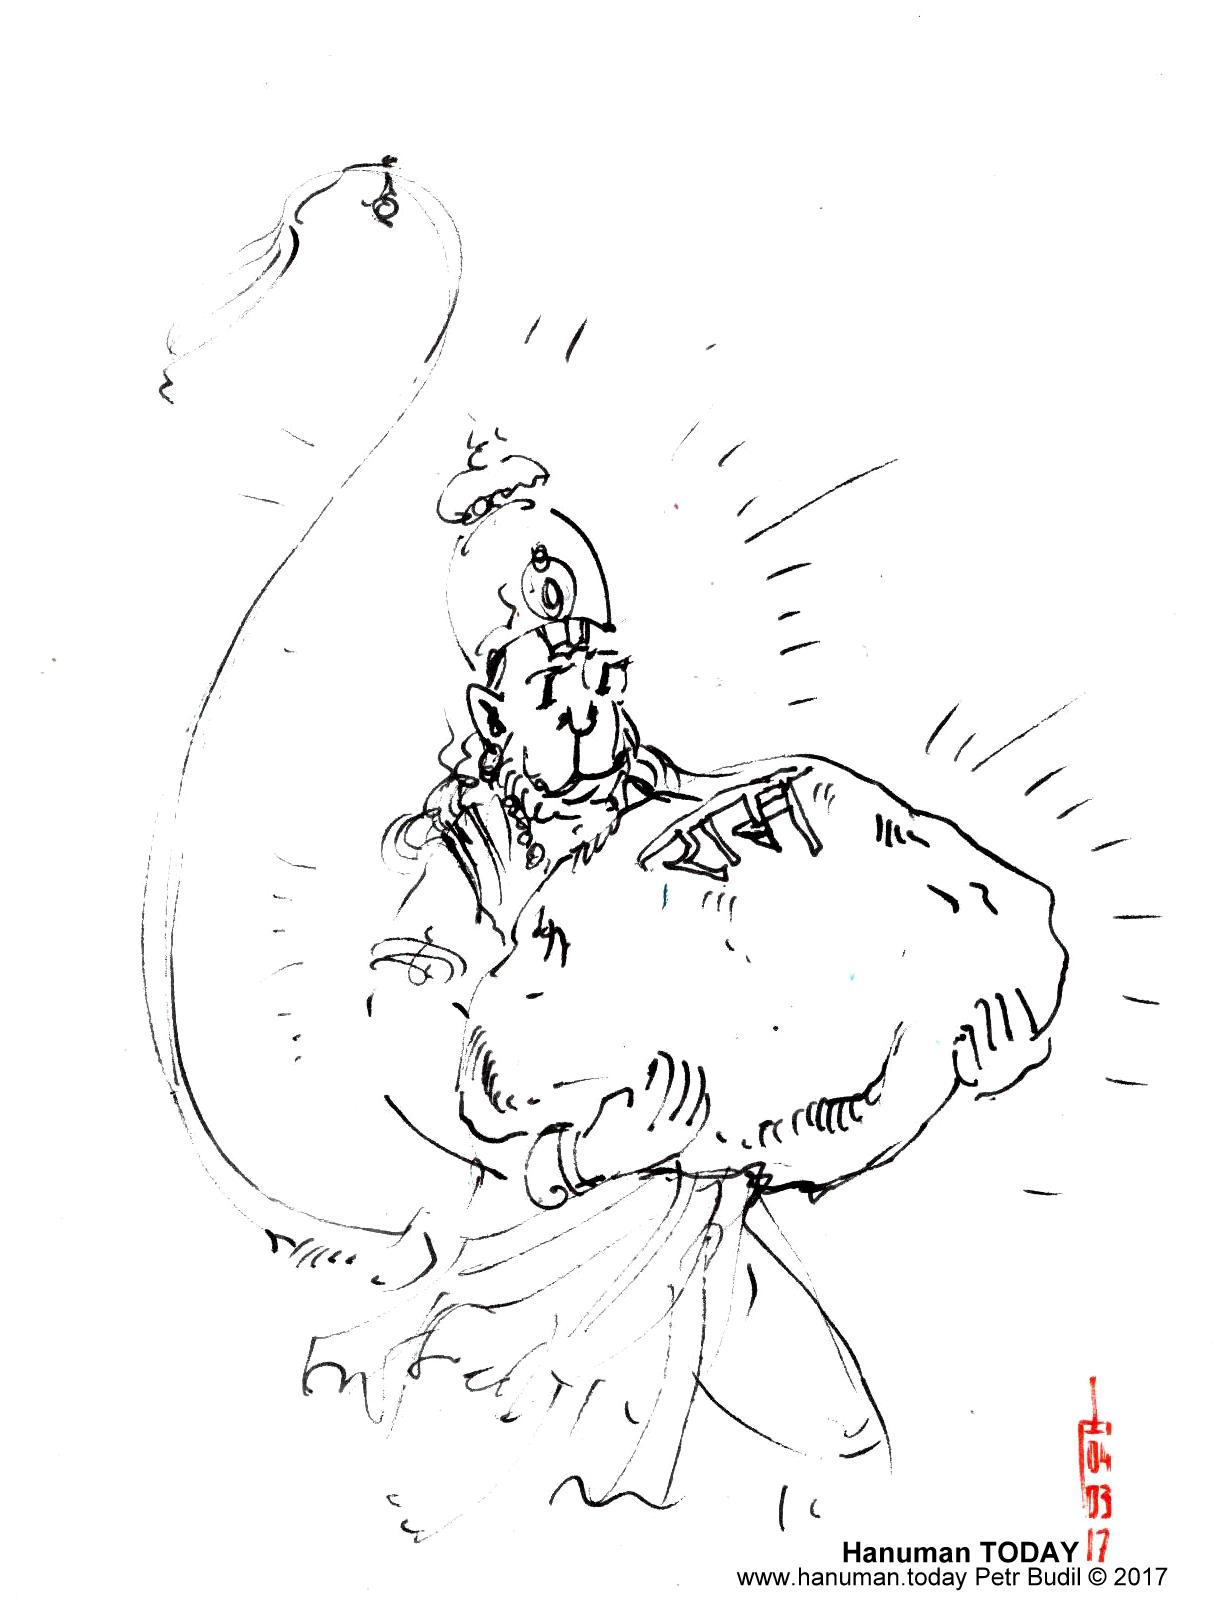 1216x1618 March 4, 2017 Daily Drawings Of Hanuman Hanuman Today